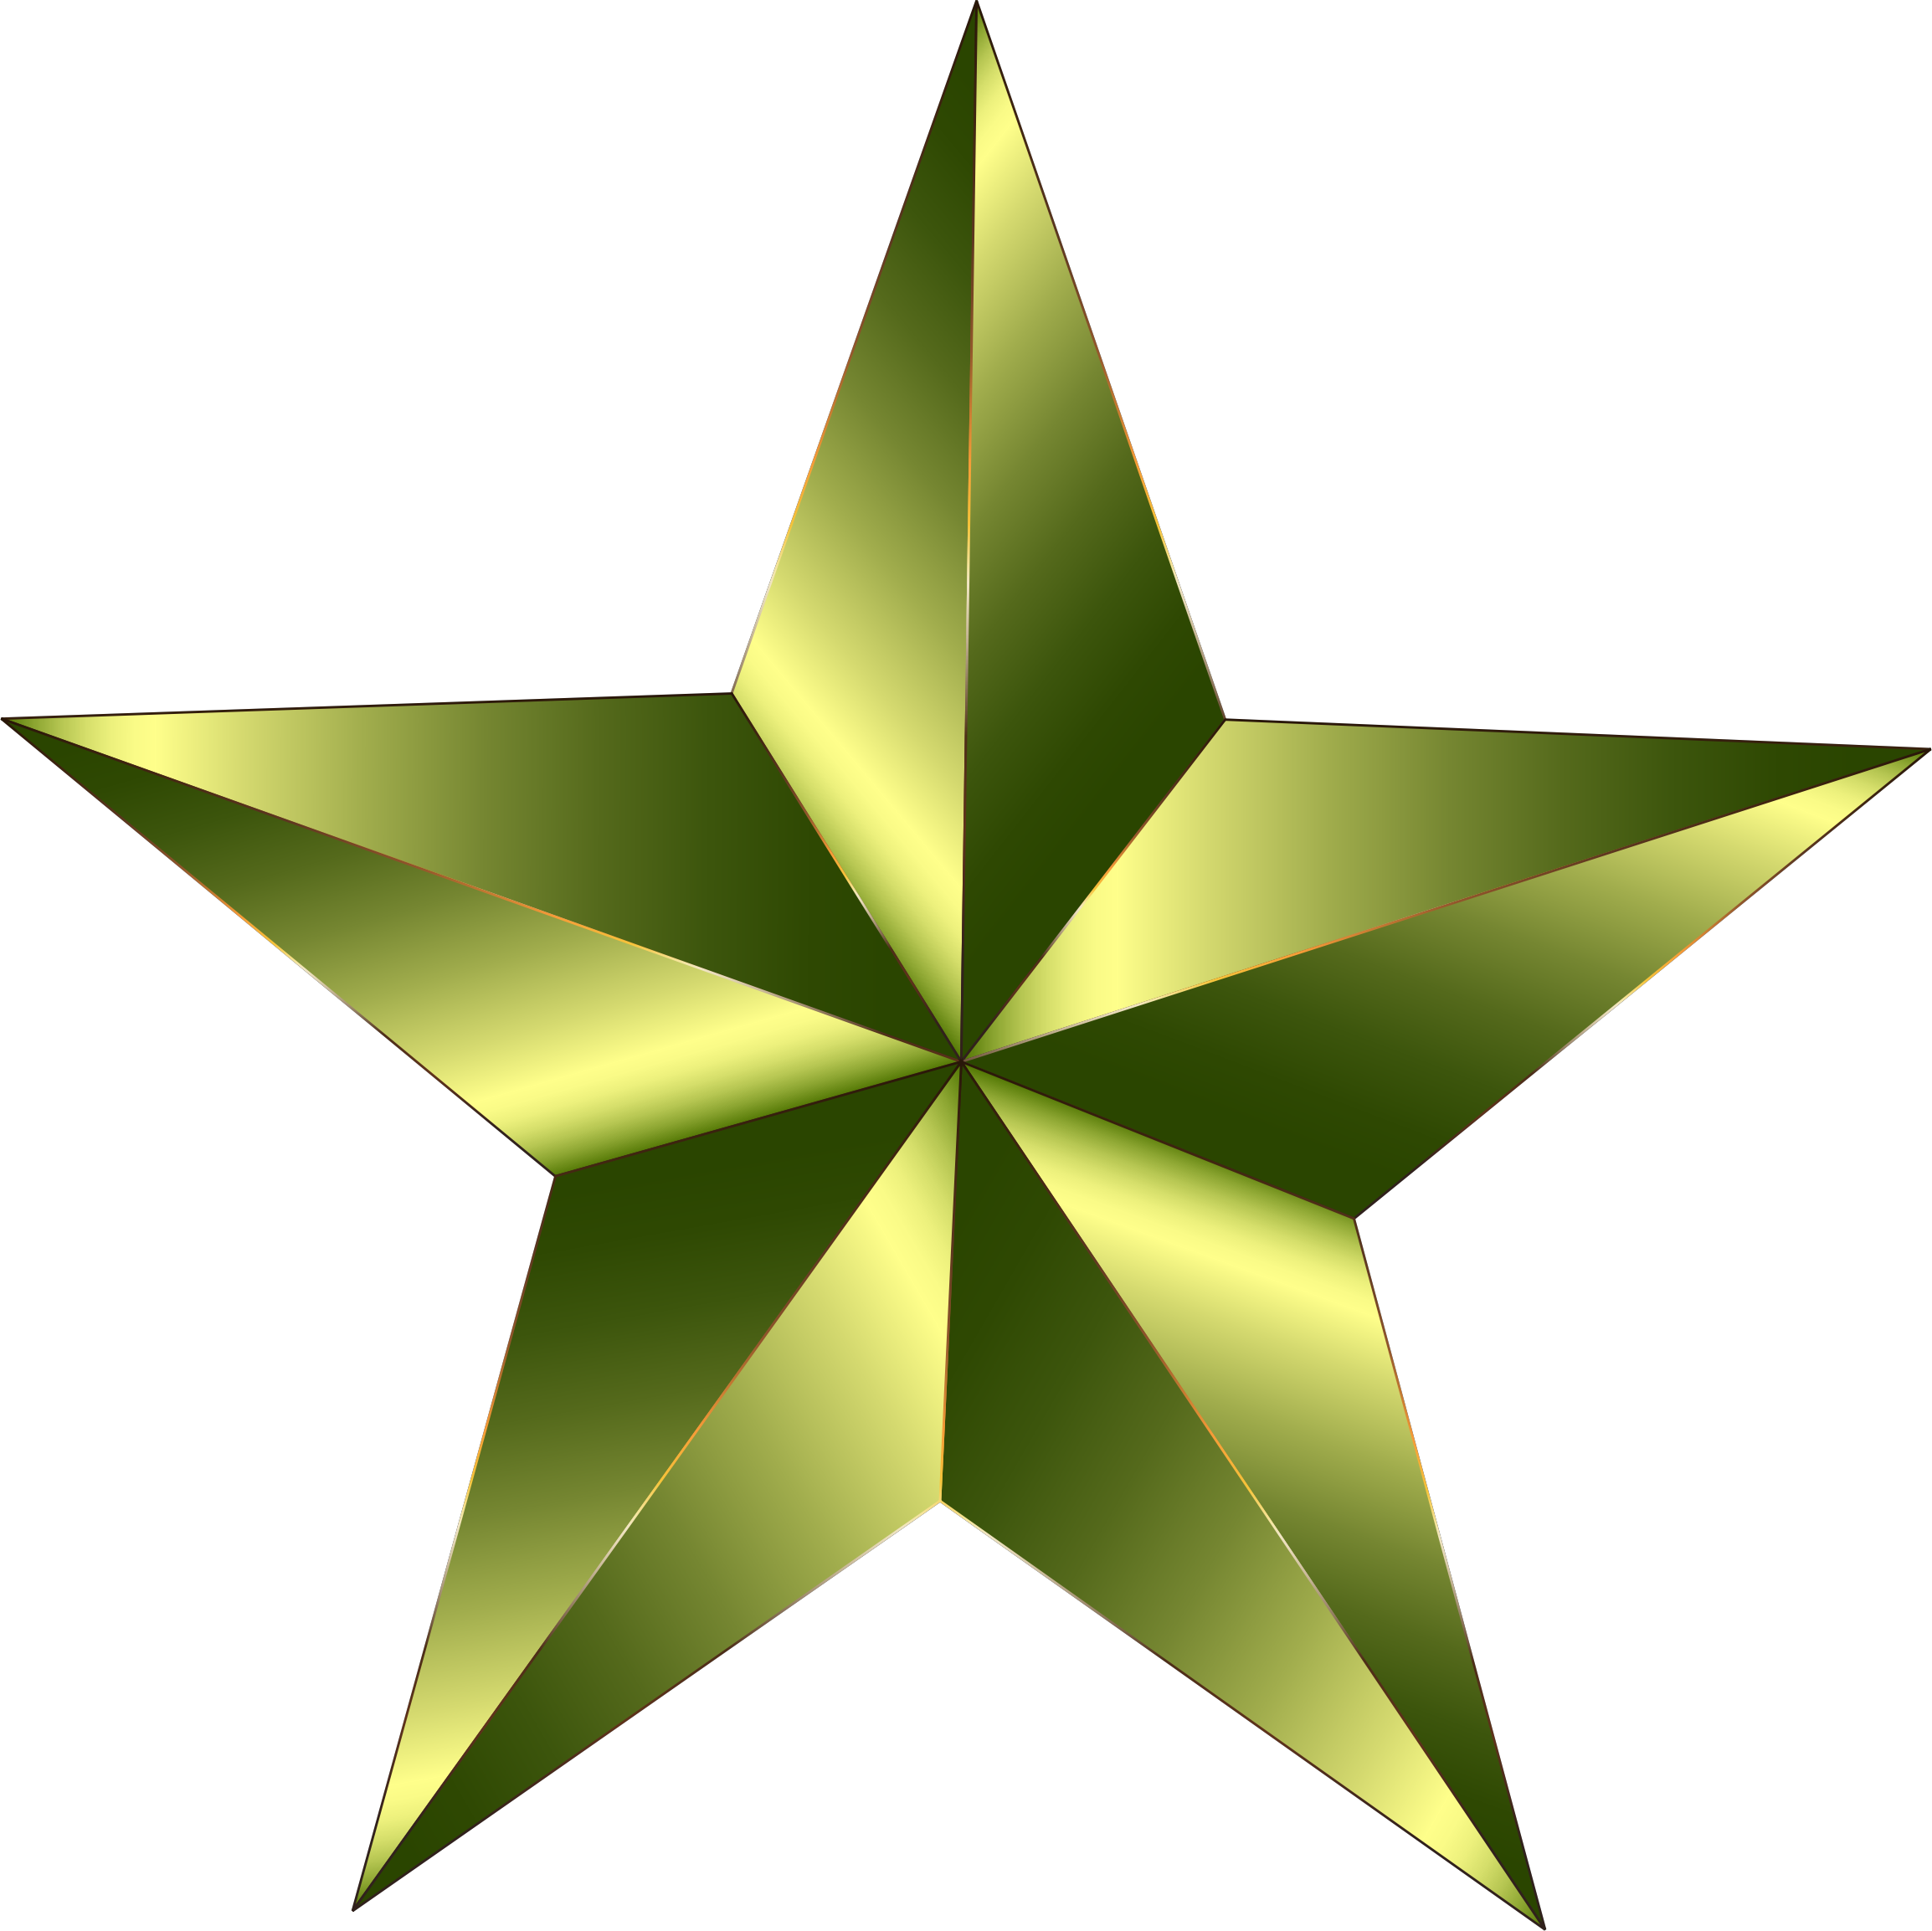 Military clipart military star, Military military star ...